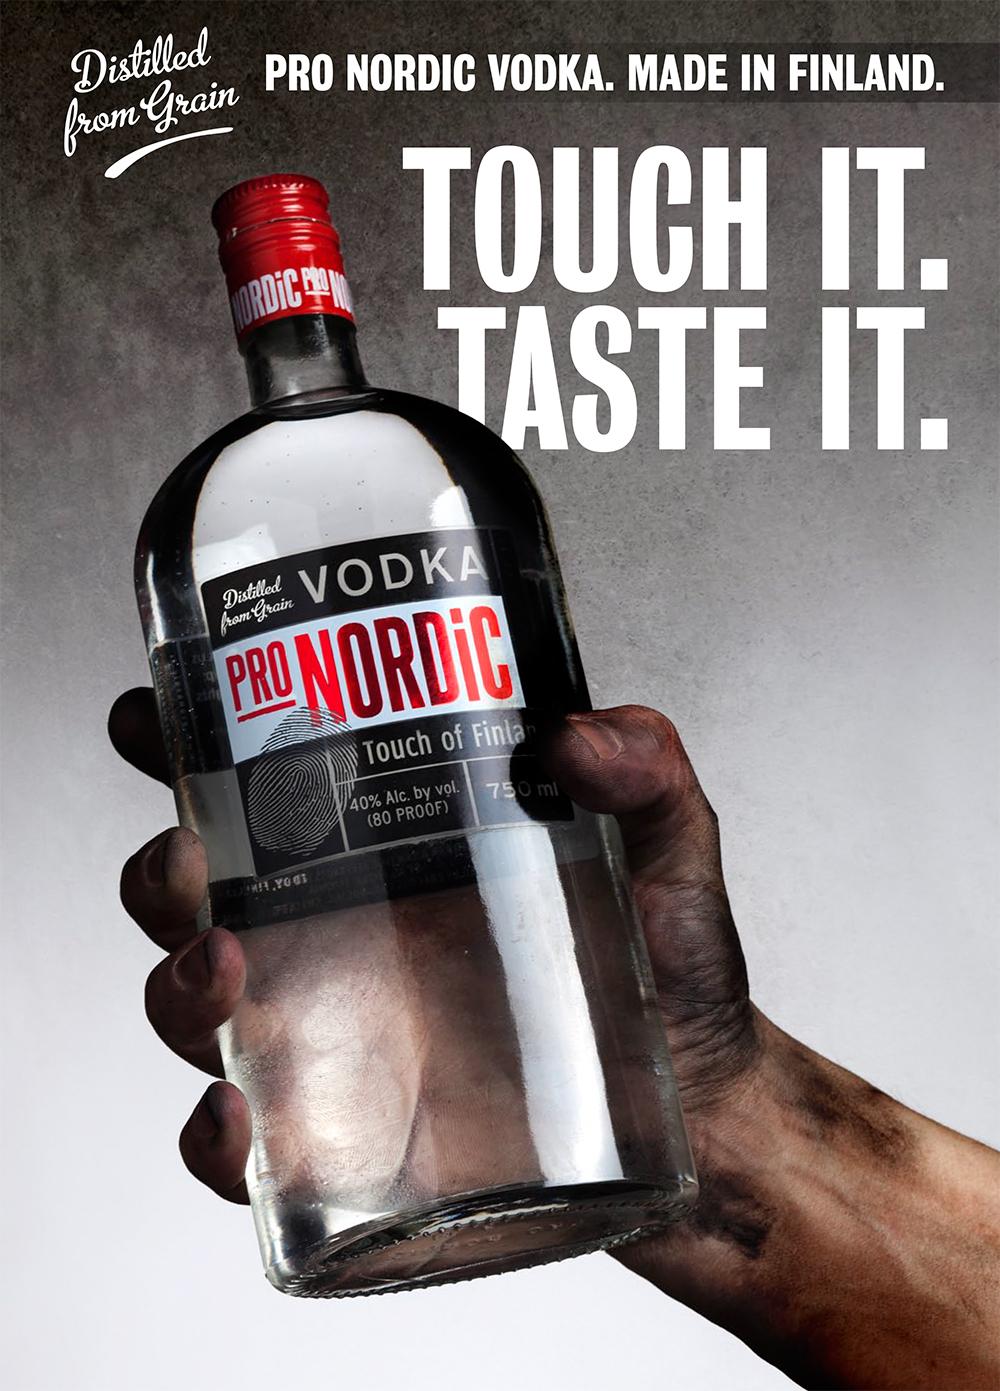 Pro Nordic Vodka consept proposal